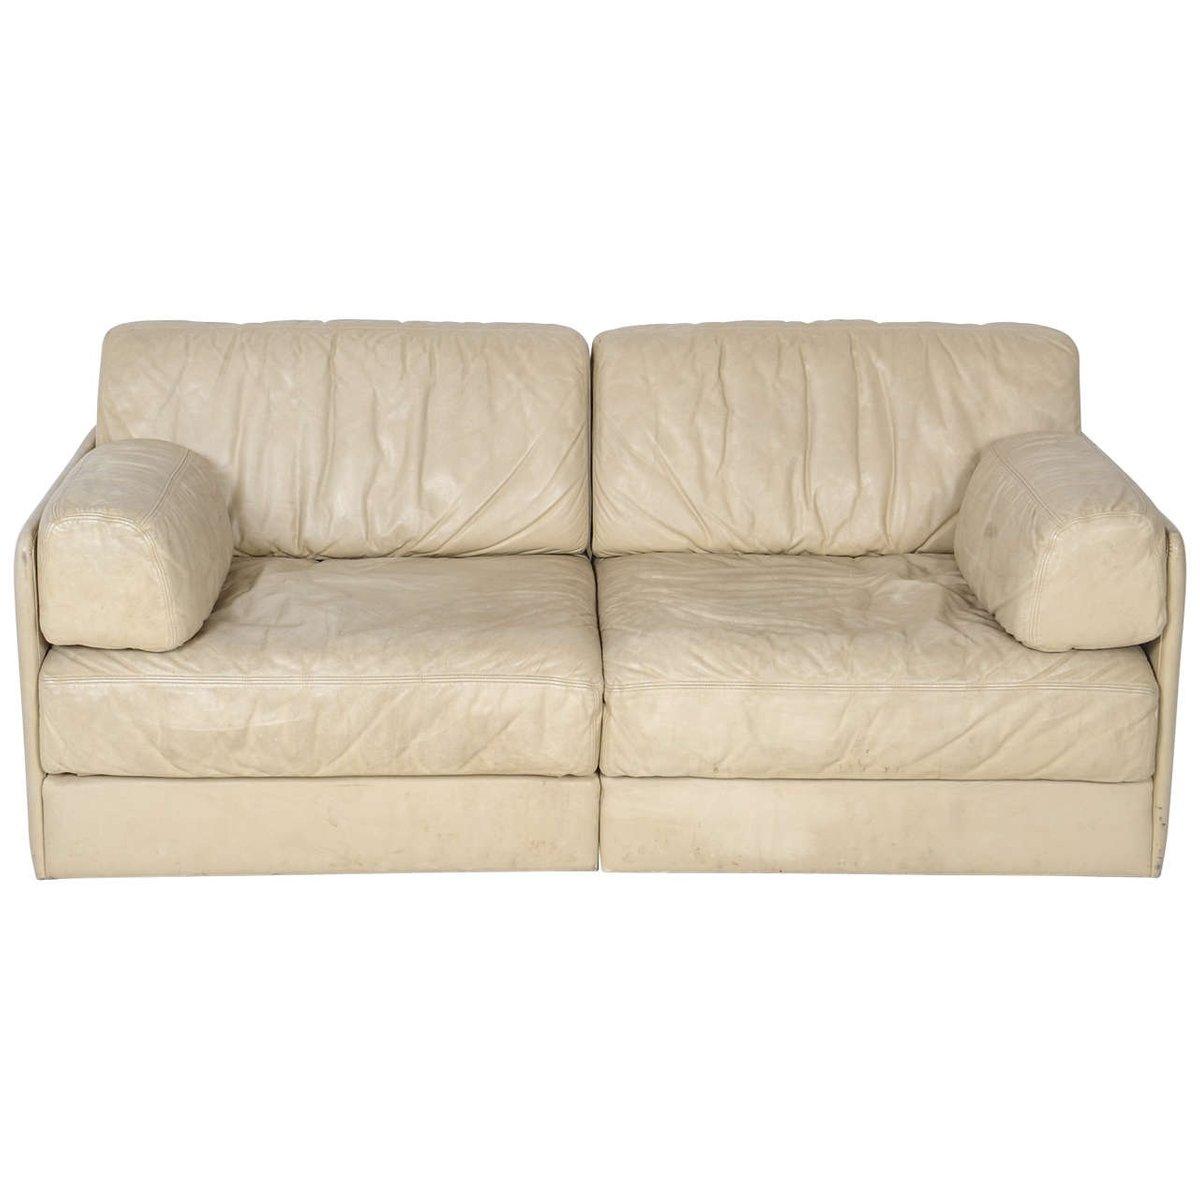 Modulares Vintage Modell DS-76 2-Sitzer Sofa von de Sede